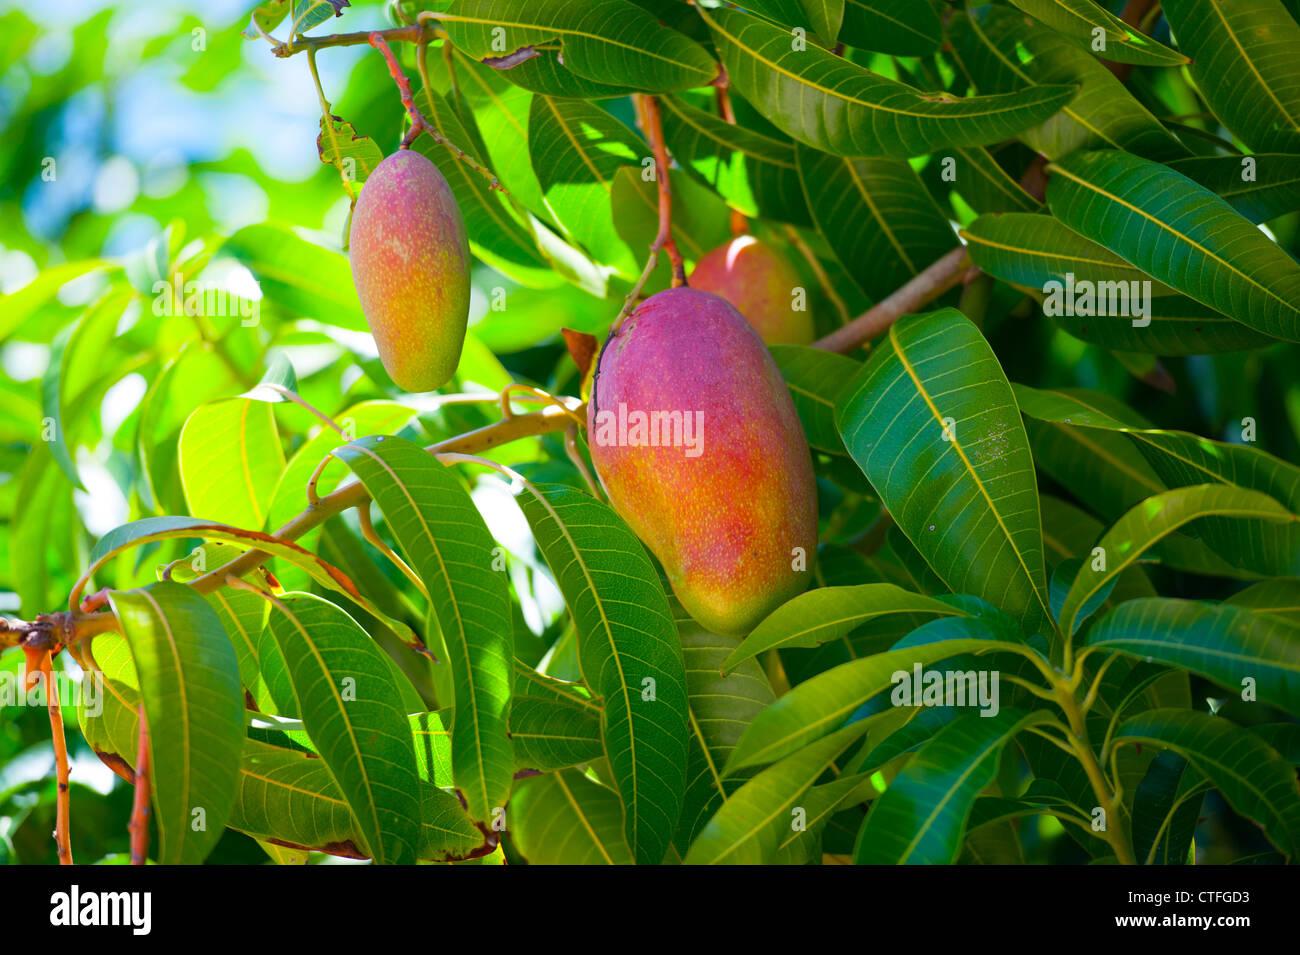 food-fruit-produce-ripe-mangoes-hang-in-